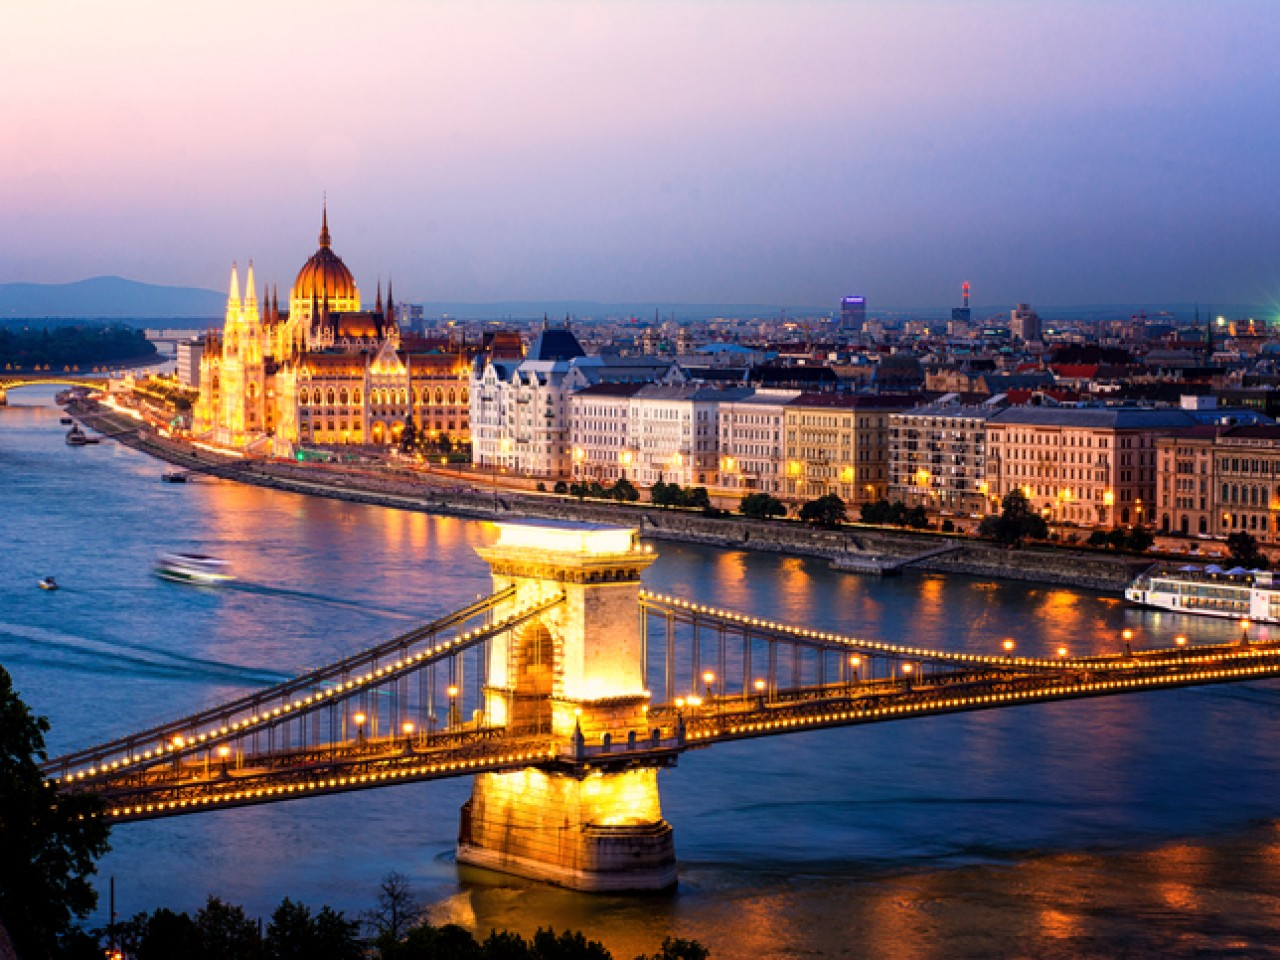 Andrea Bocelli Concert Break Budapest, 15 Nov 19